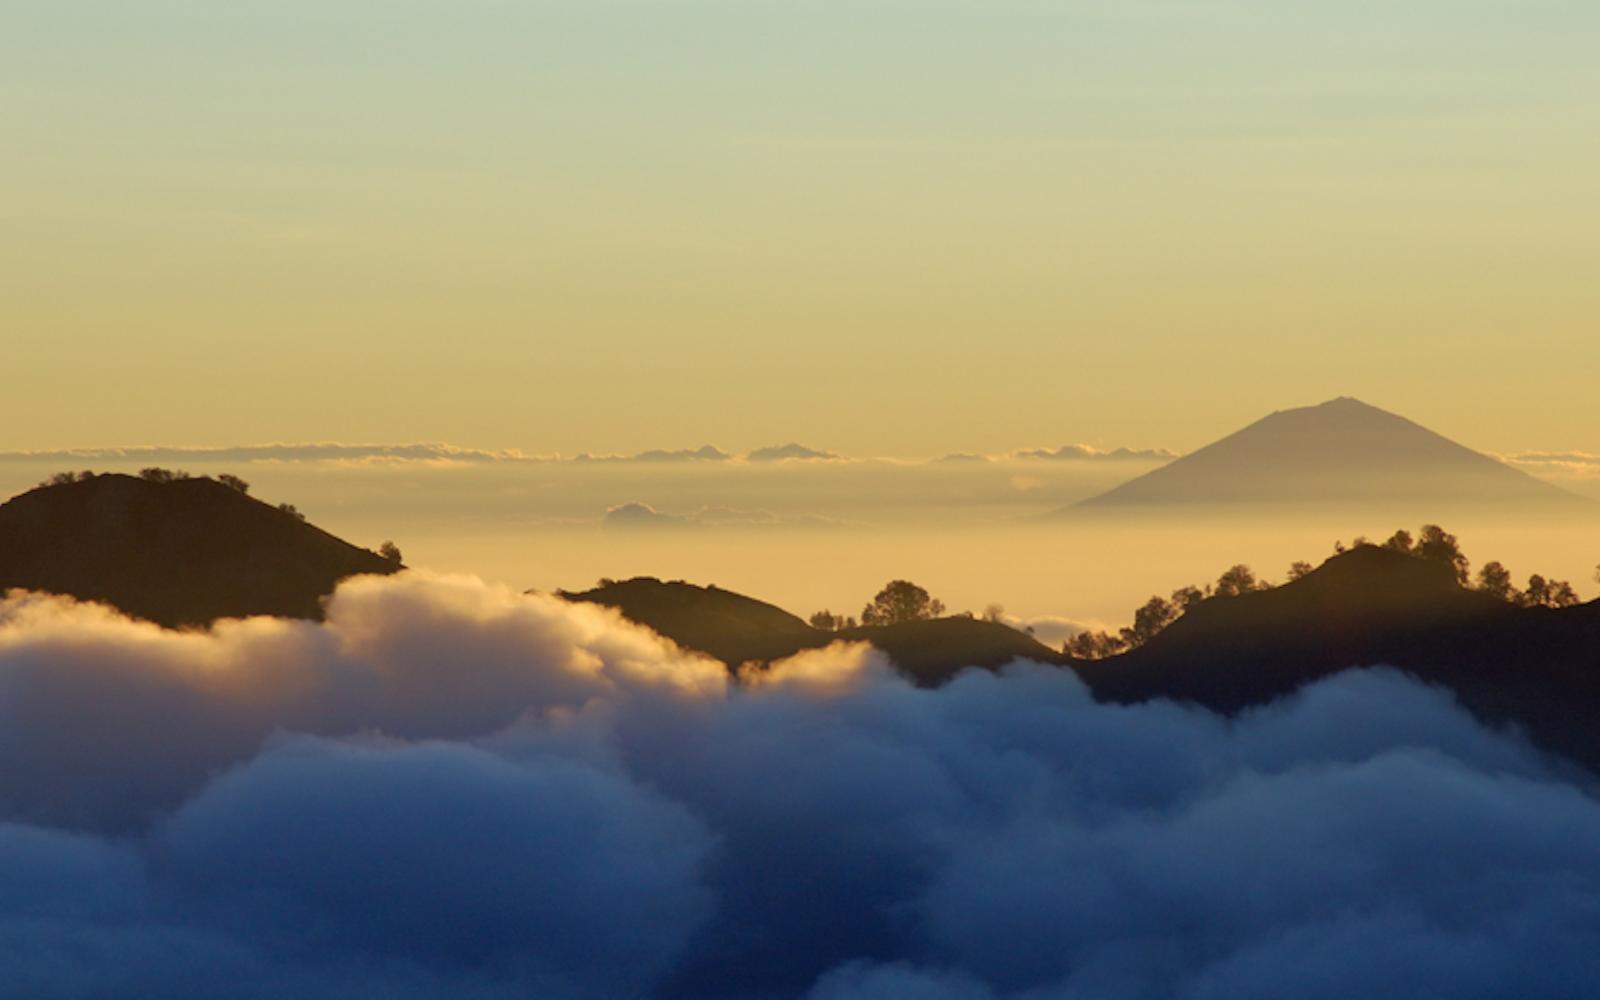 Bali skyline